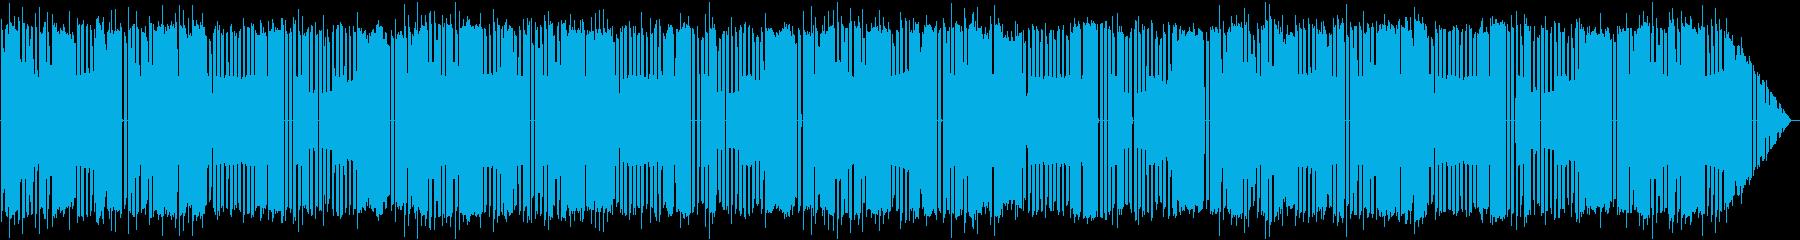 【8bit】『メヌエット』ト長調の再生済みの波形